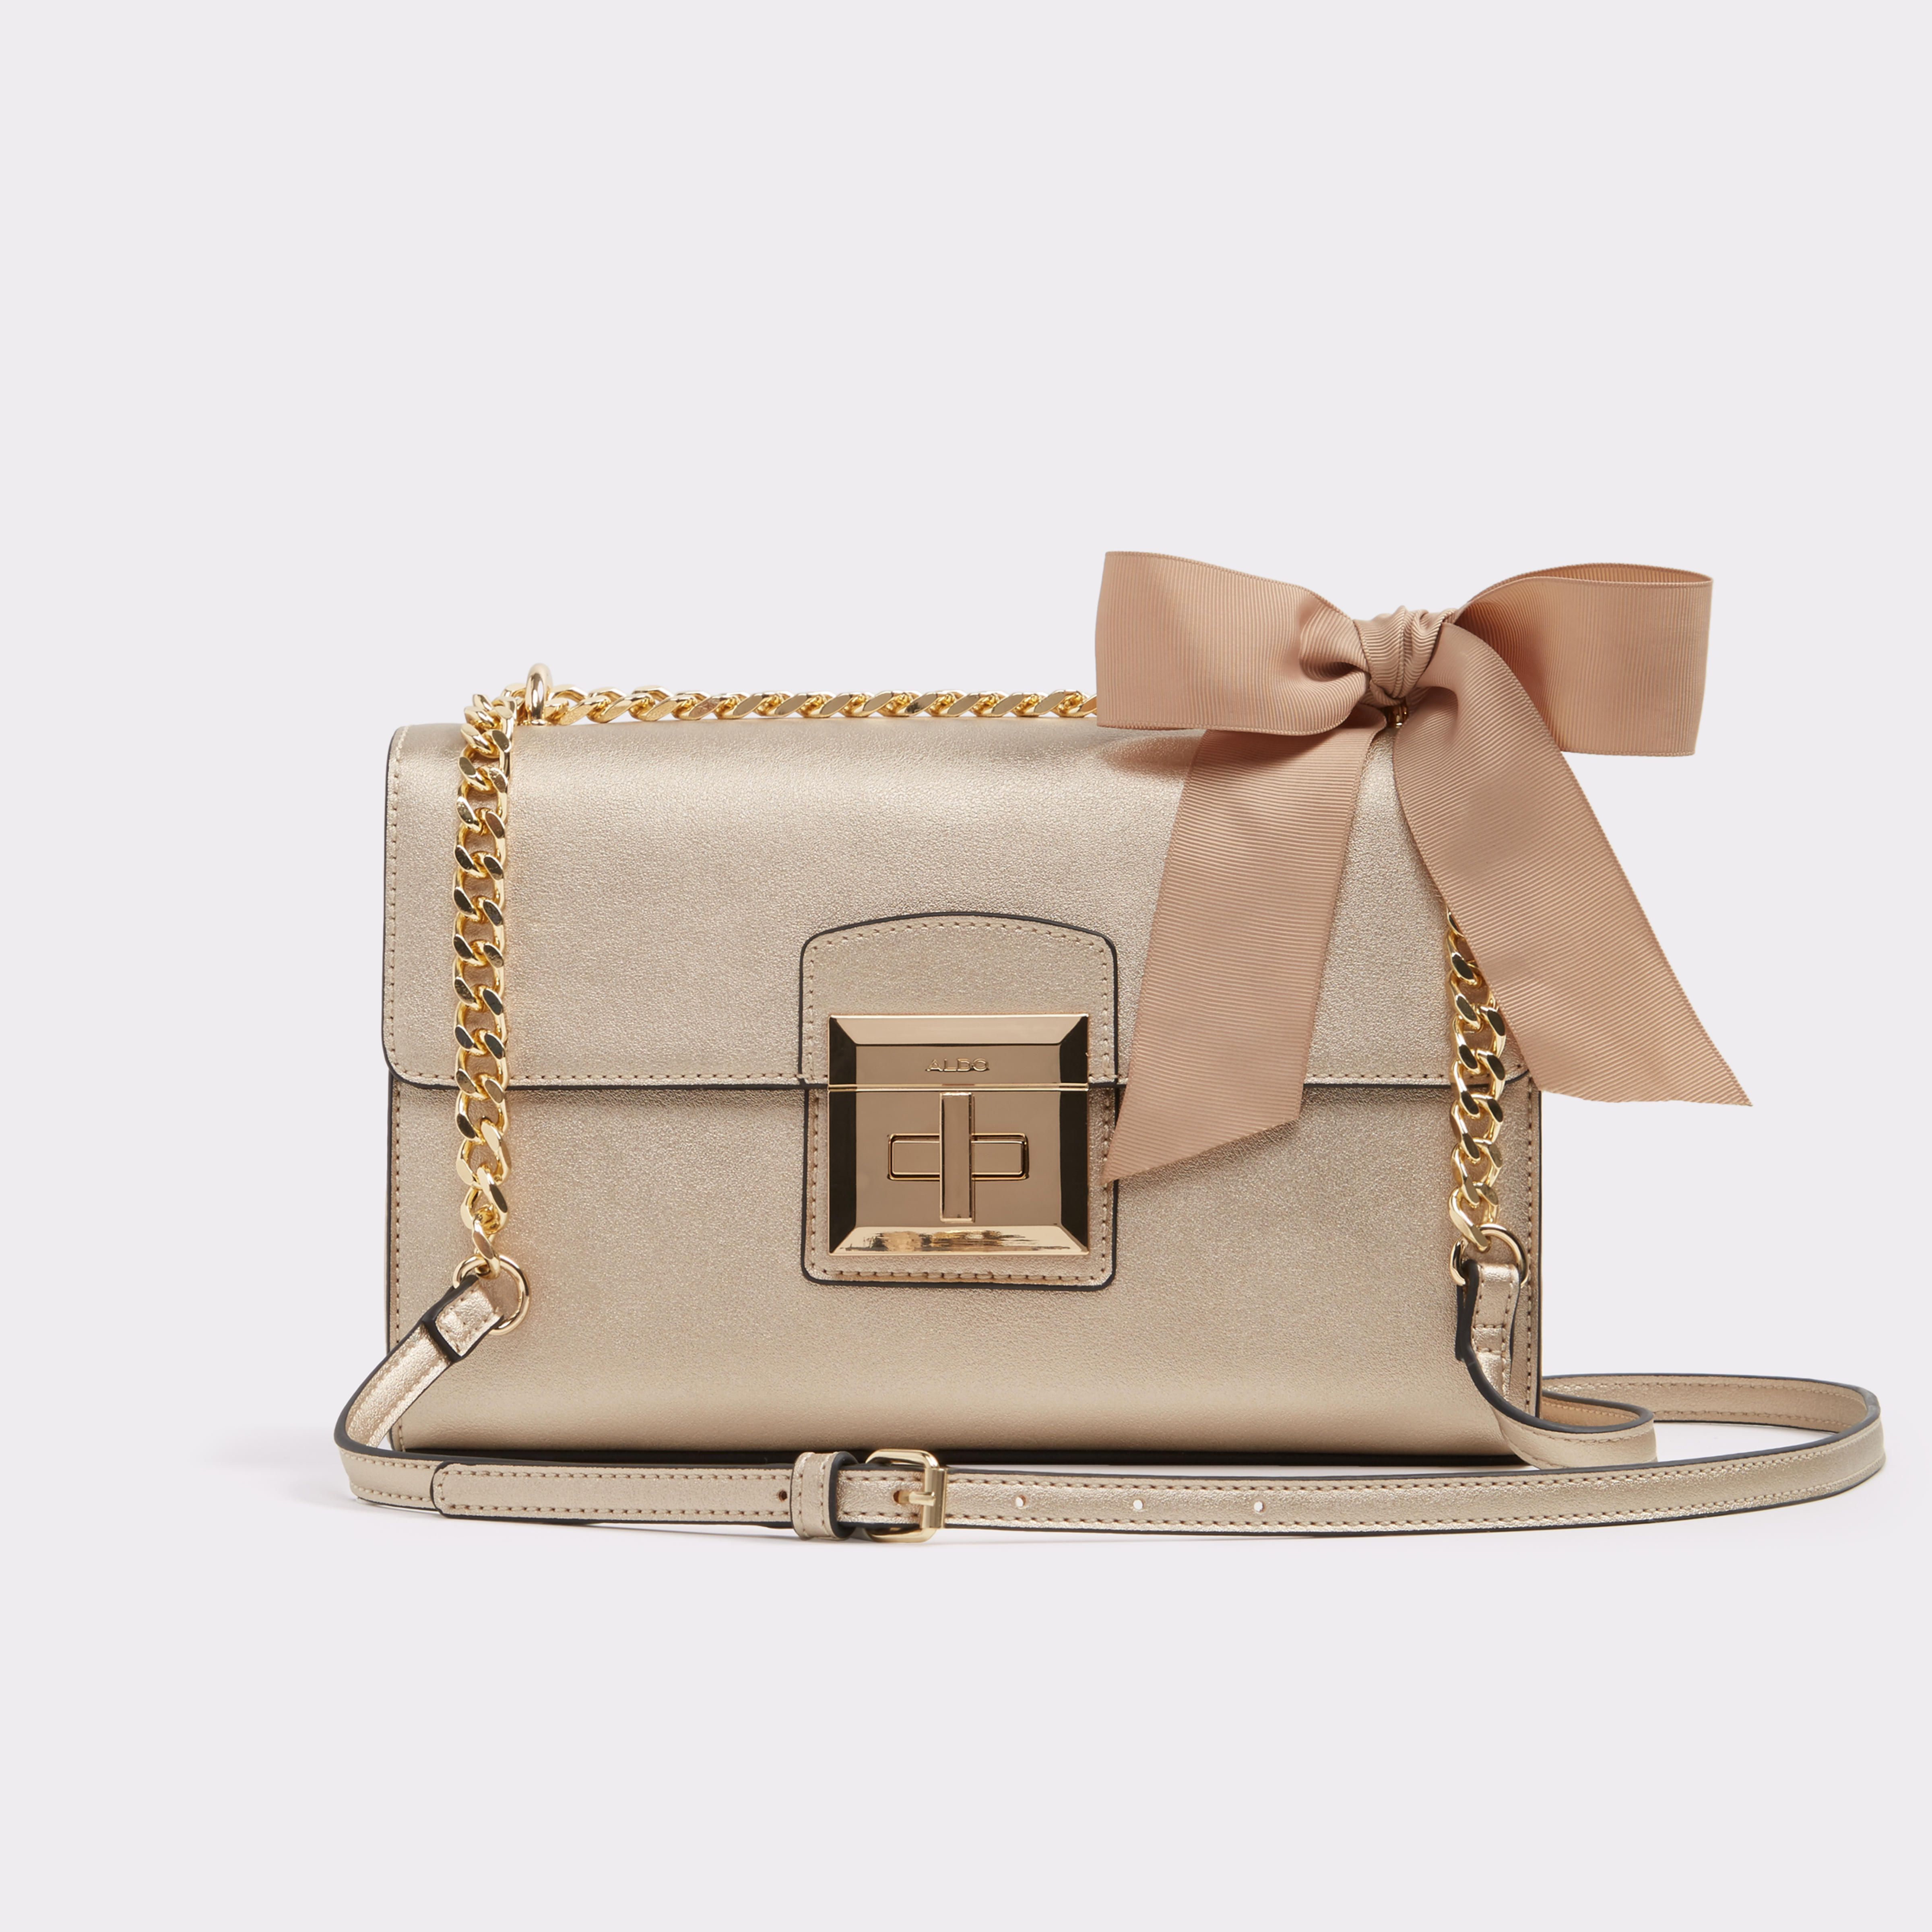 aldo us handbags - 61% OFF - tajpalace.net